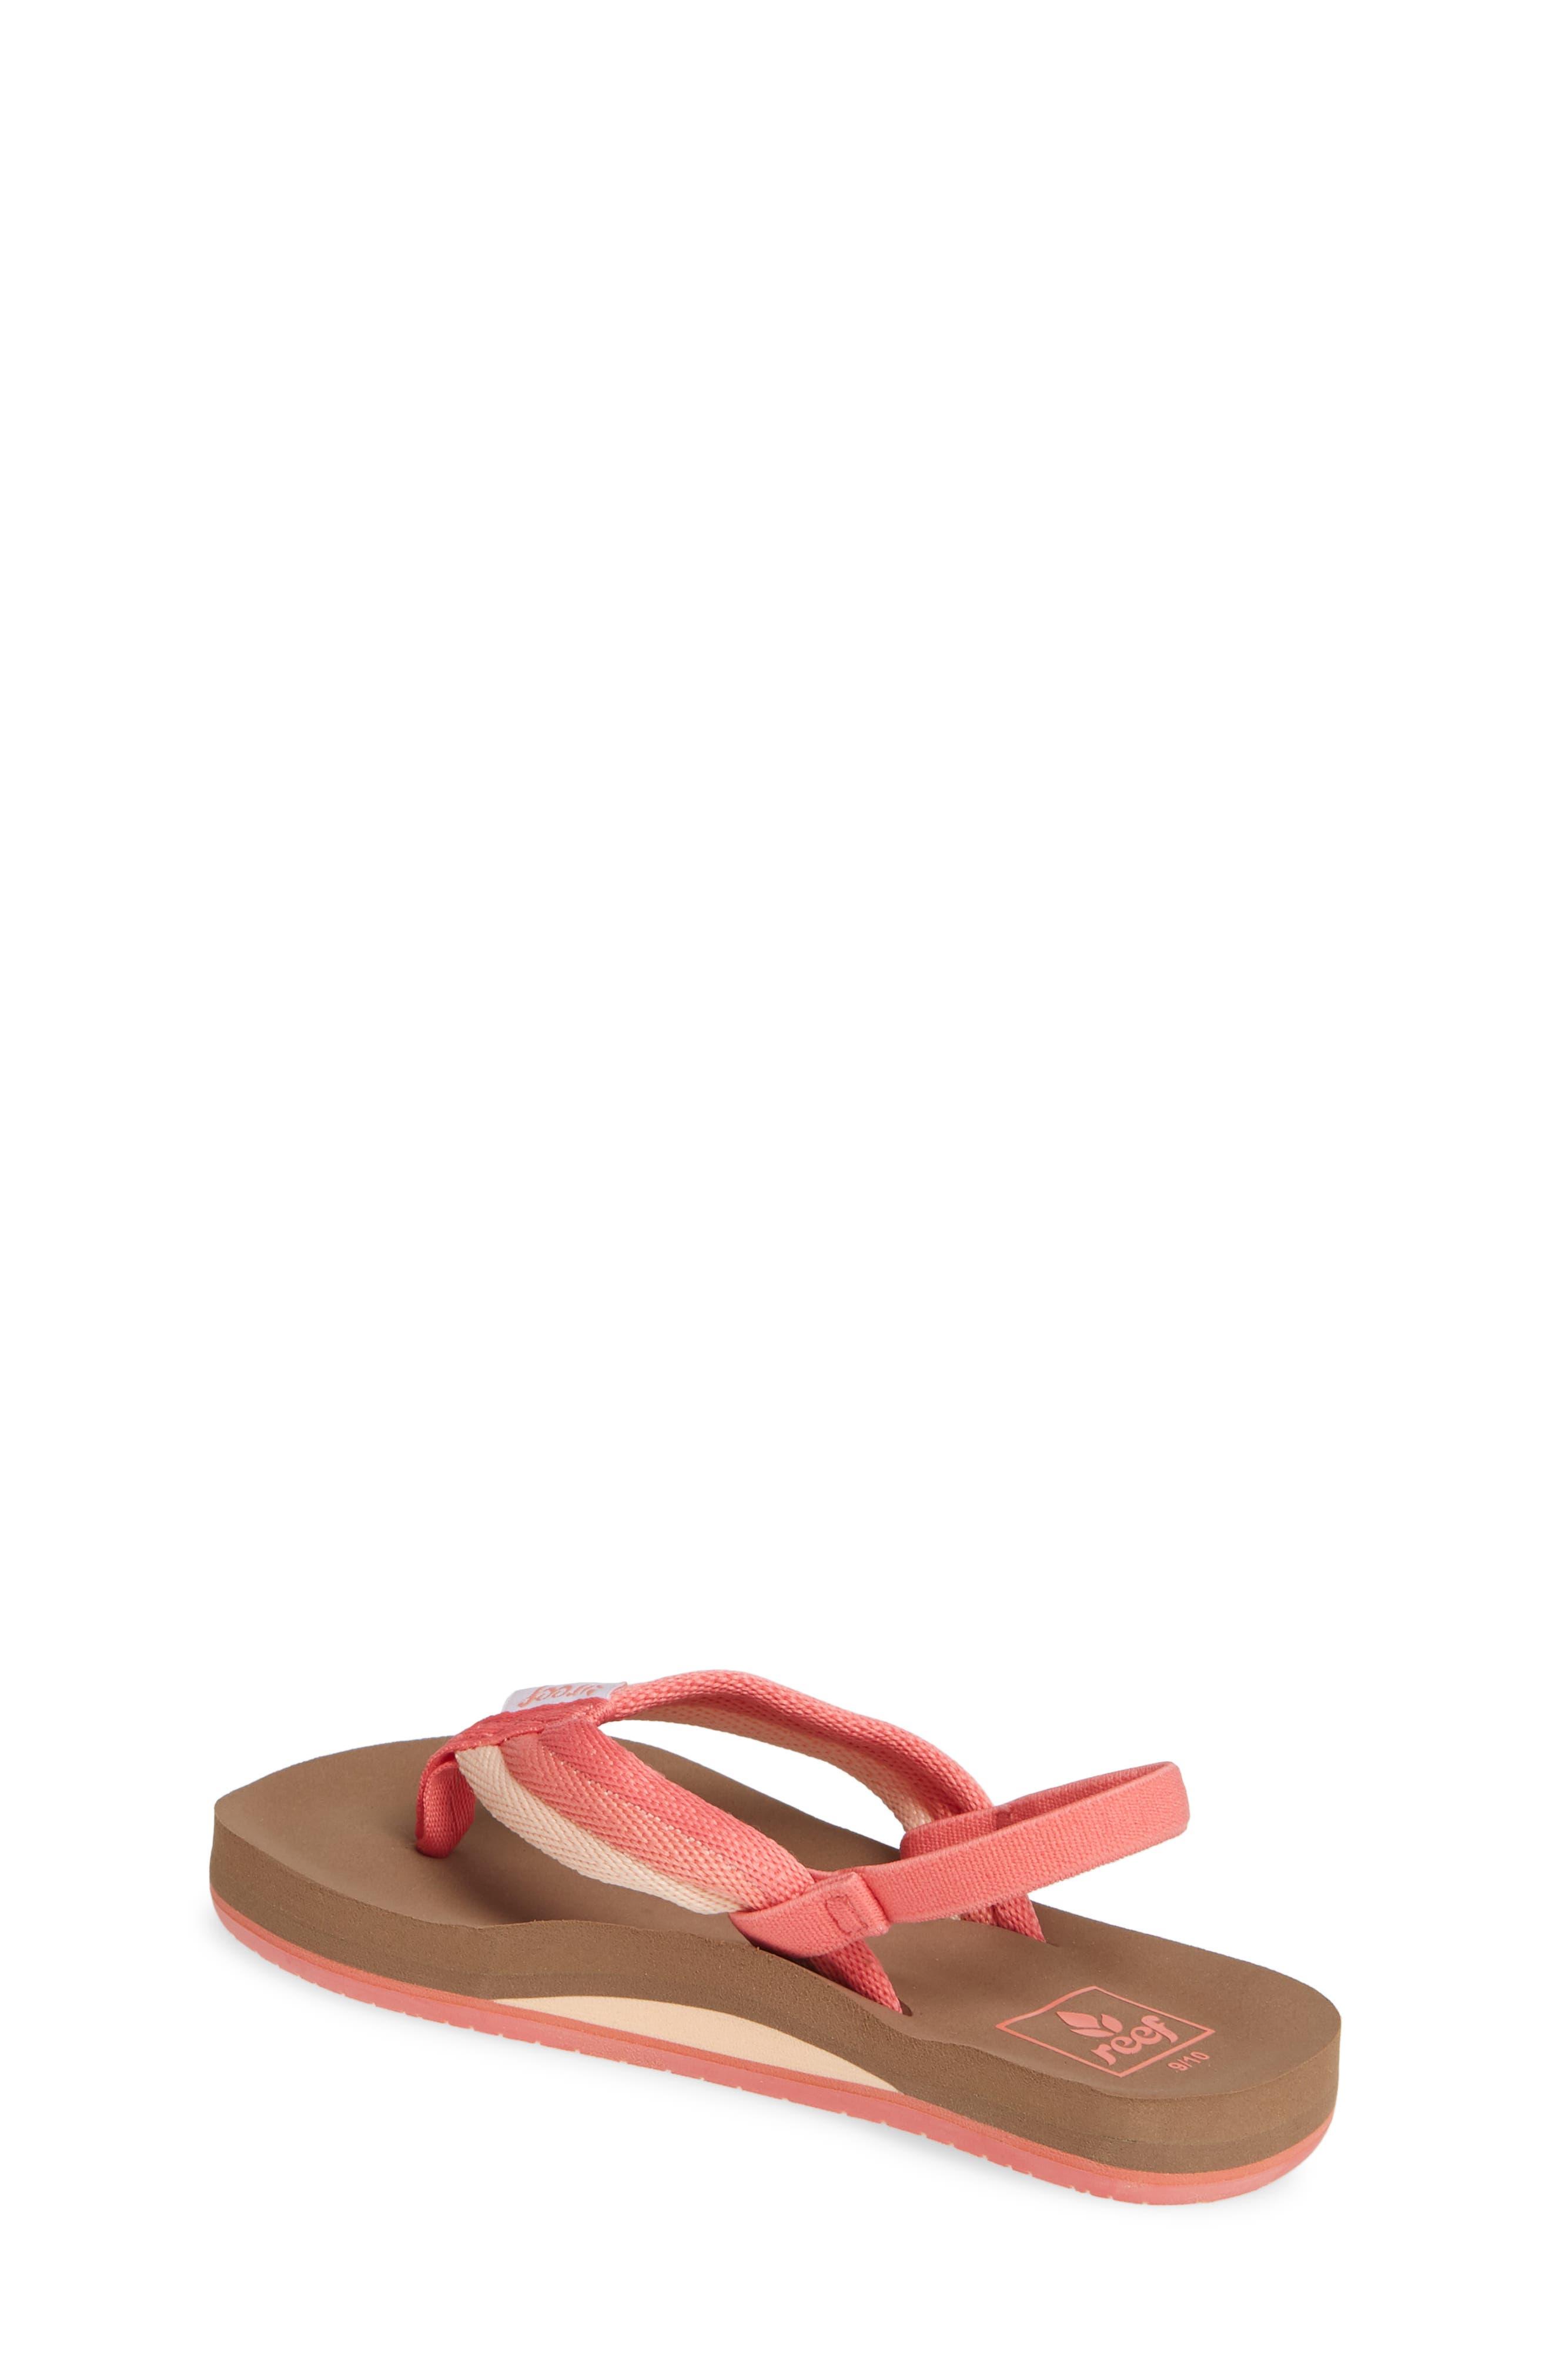 REEF, Little Ahi Beach Thong Sandal, Alternate thumbnail 2, color, RASPBERRY